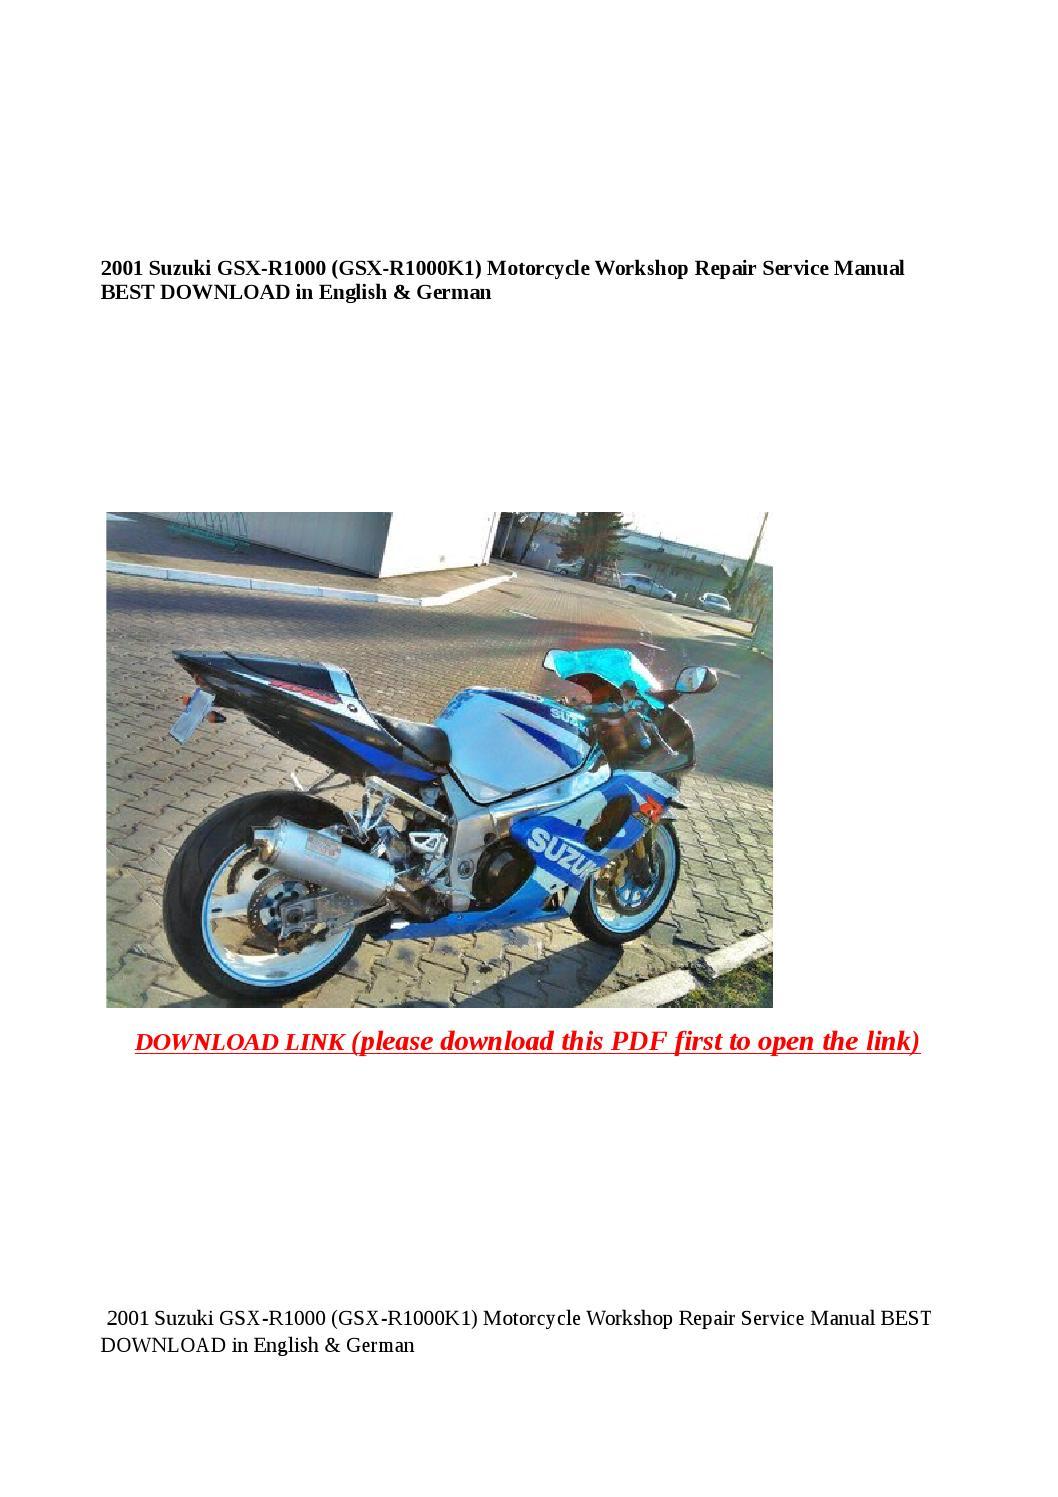 2001 suzuki gsx r1000 (gsx r1000k1) motorcycle workshop repair service  manual best download in engli by Anna Tang - issuu